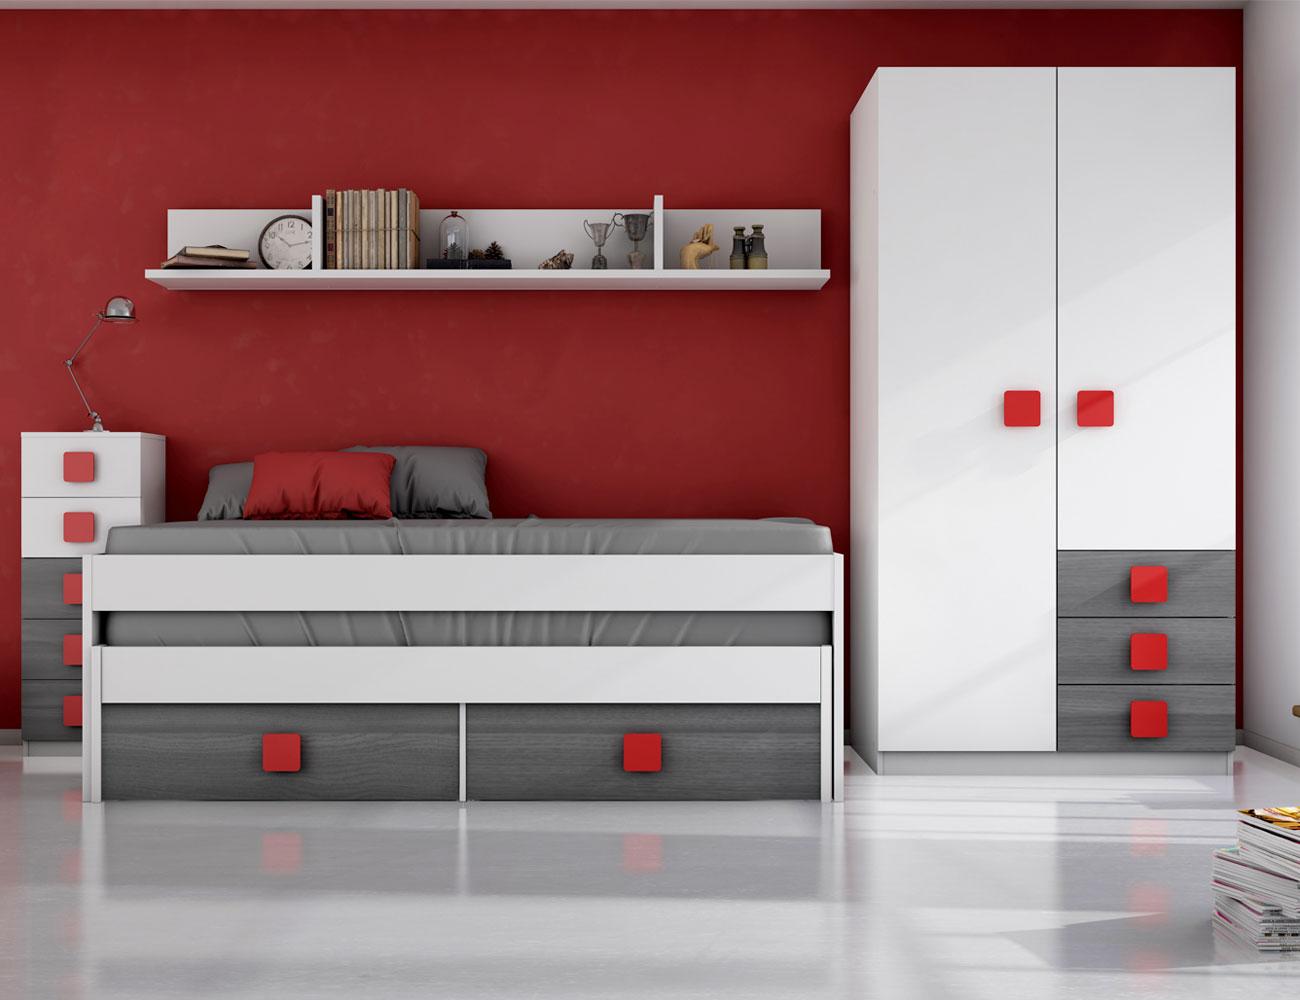 Dormitorio juvenil ceniza rojo2